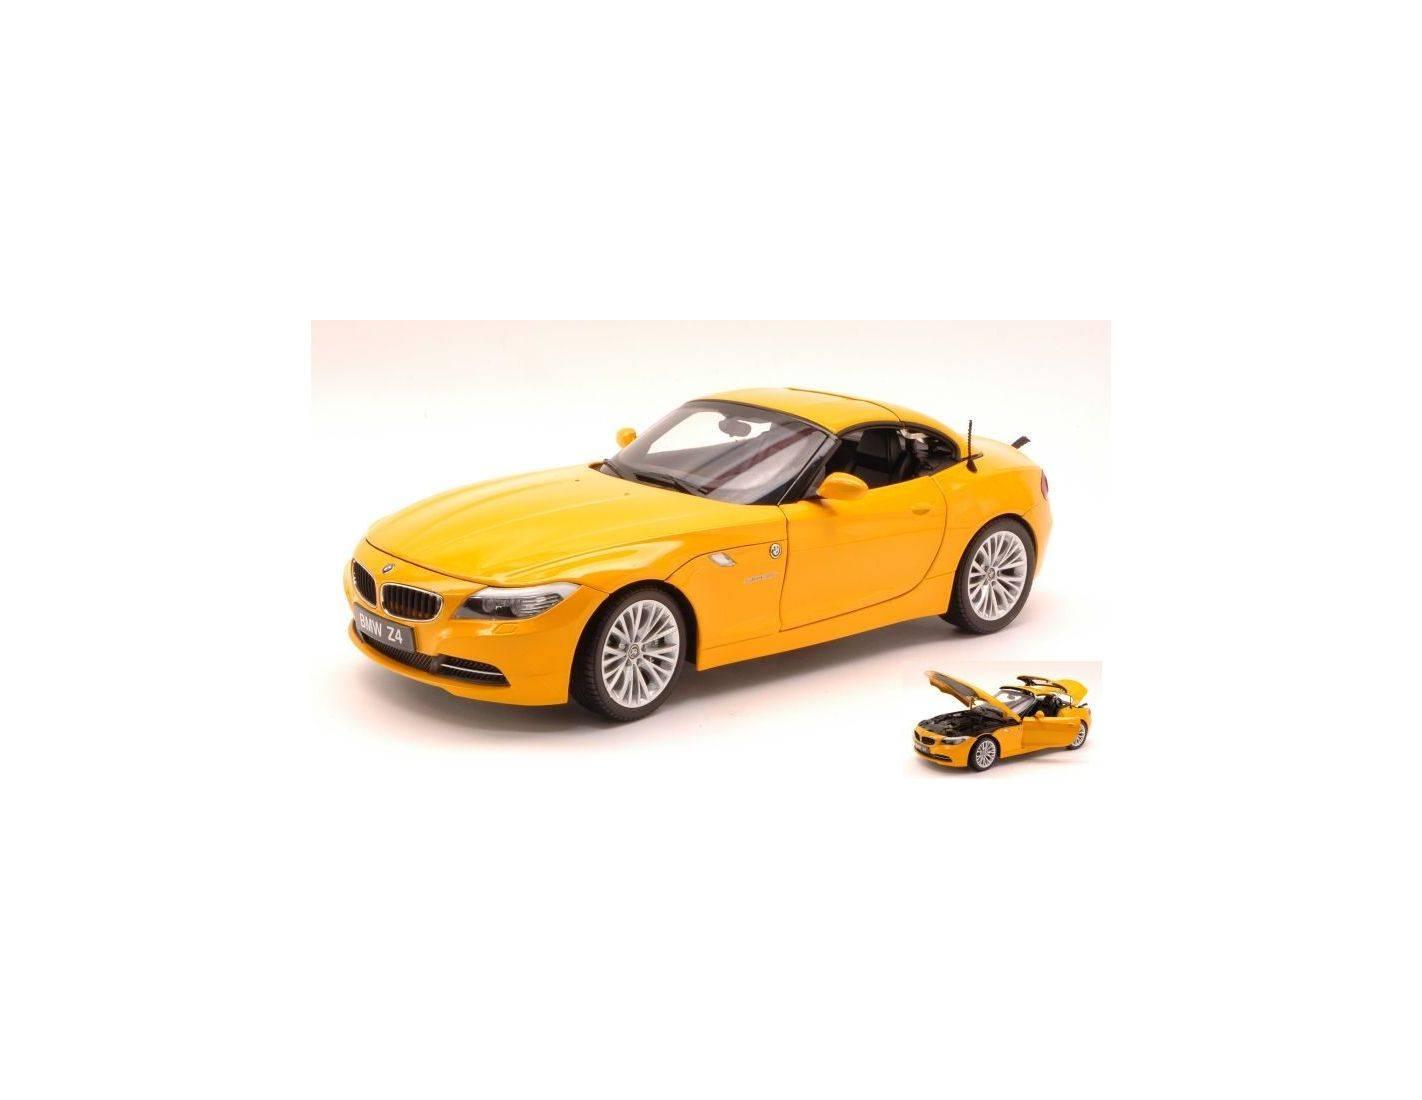 Kyosho Ky8771ay Bmw Z4 Convertible S Drive E89 2009 Atacama Yellow 1 18 Modellino